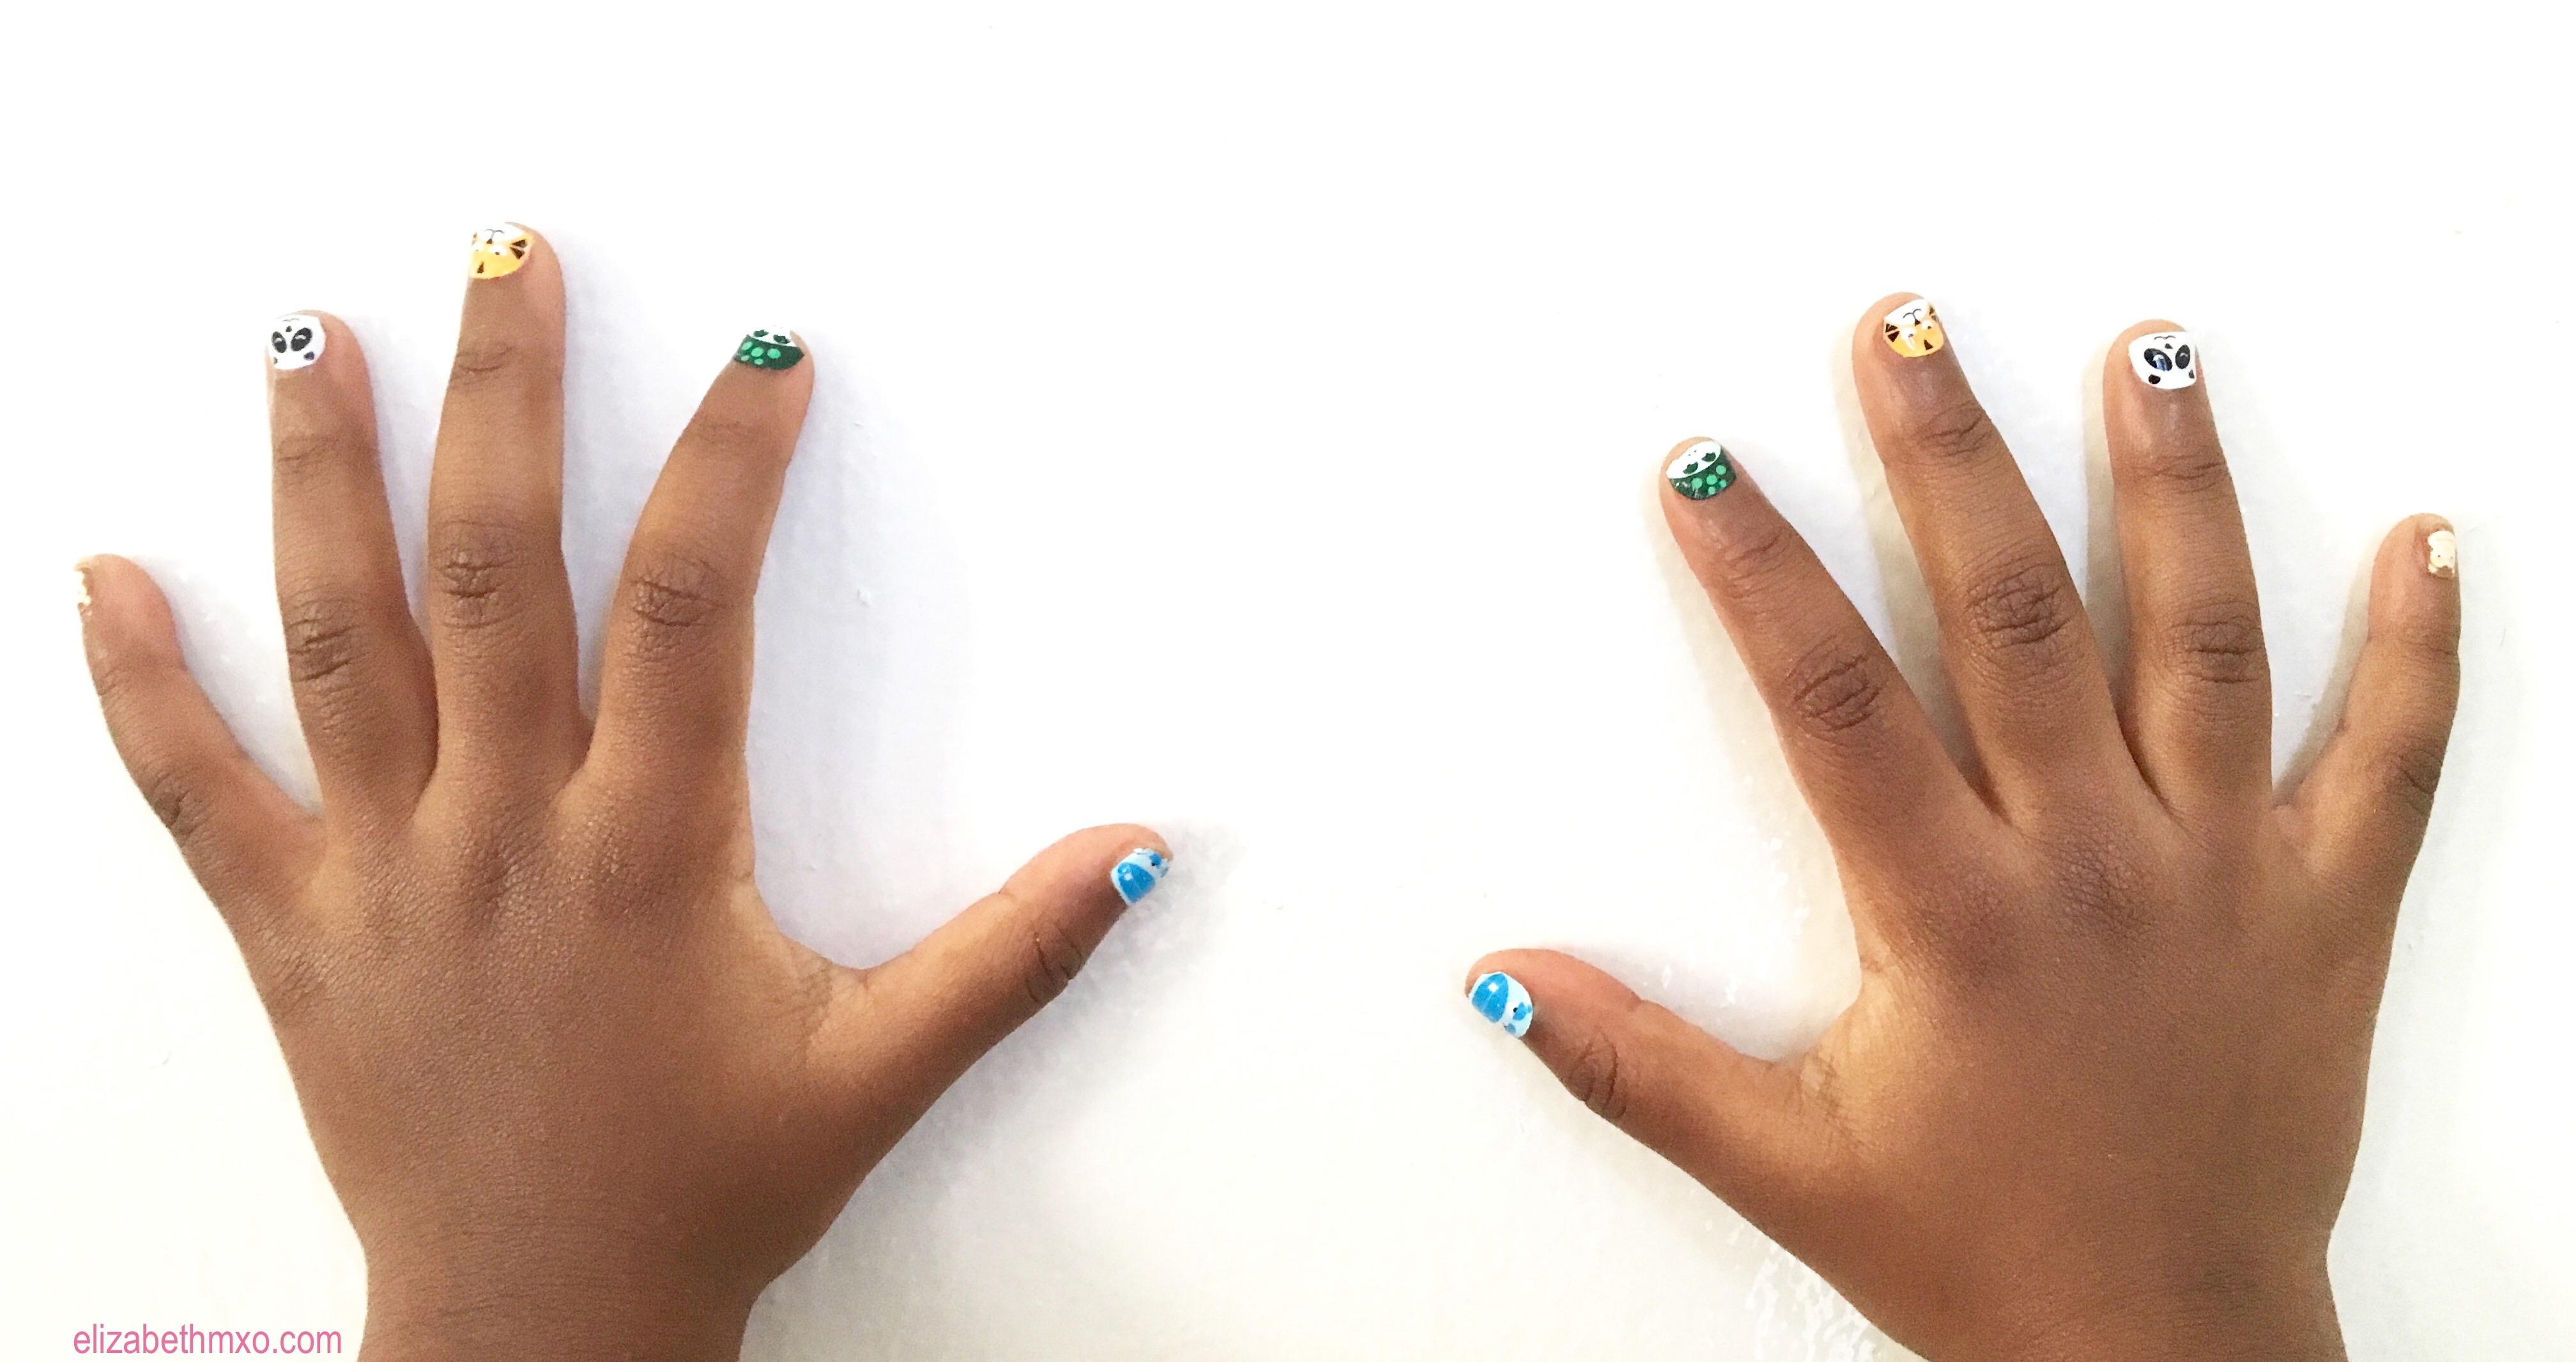 Nail Stickers for Kids - Elizabeth M xo